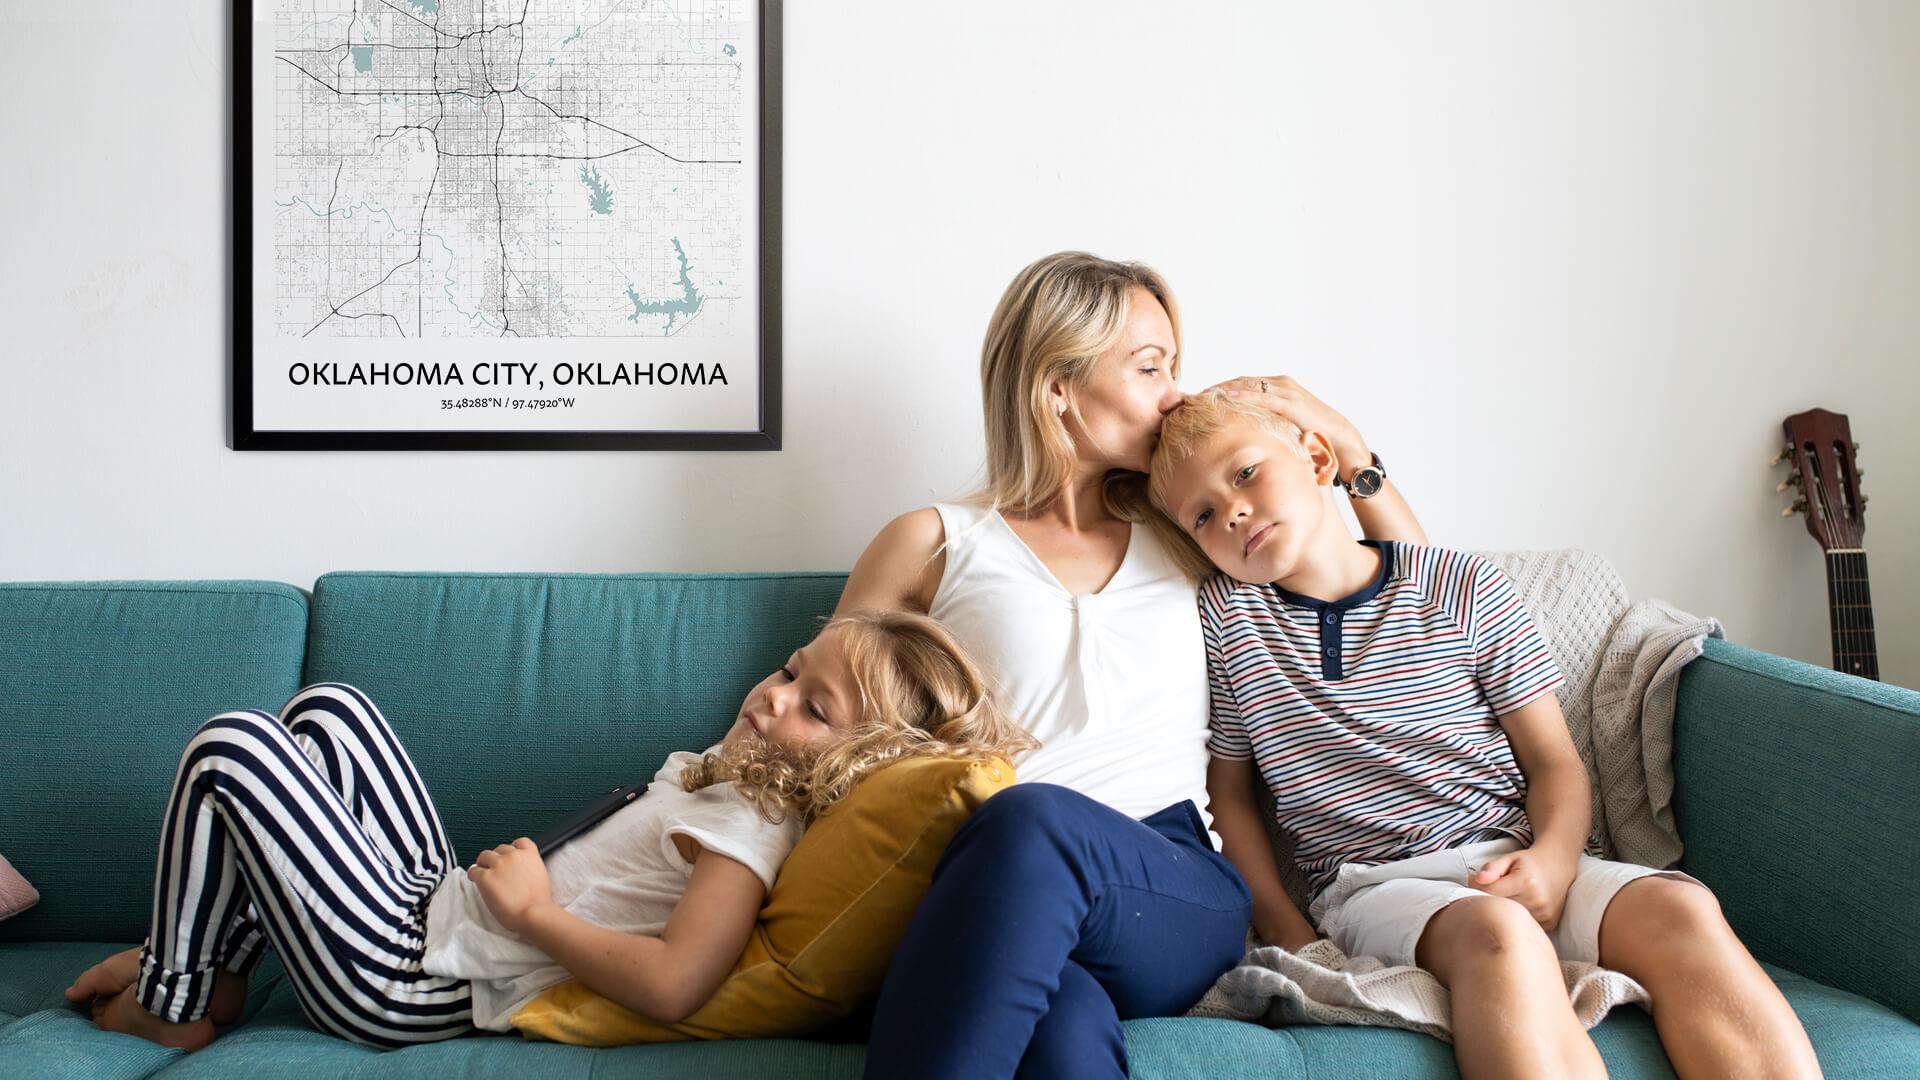 Oklahoma City map poster